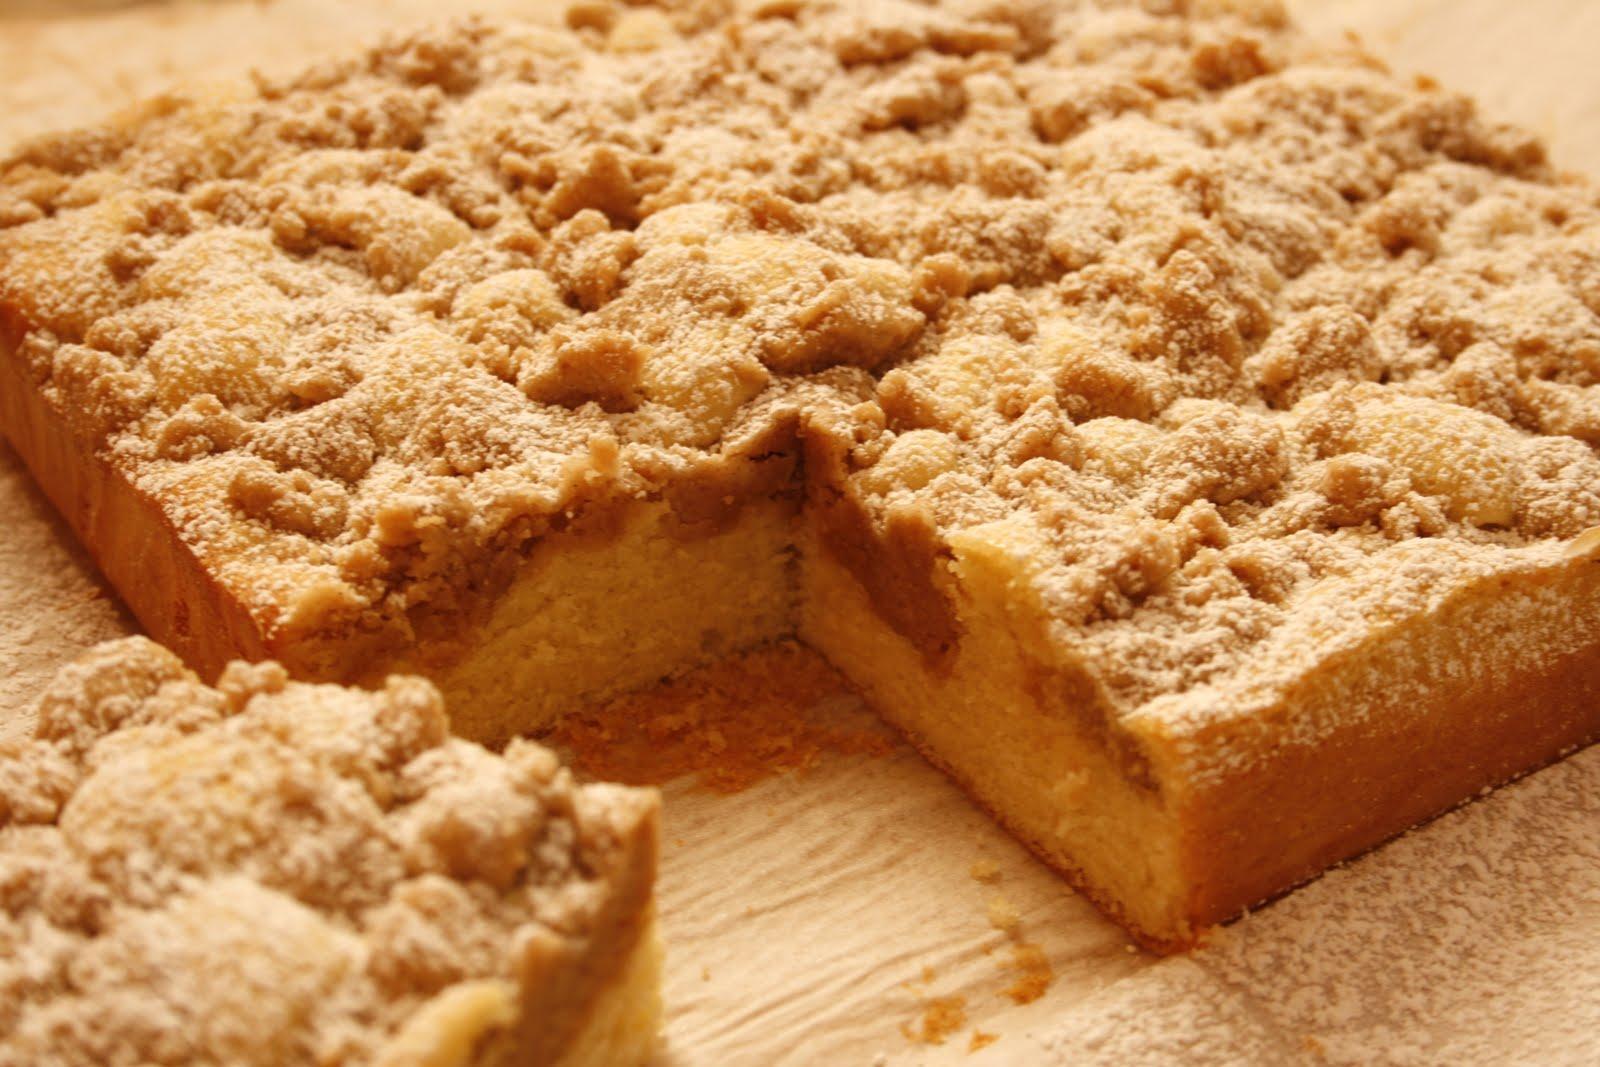 Laura's Sweet Spot: New York Style Crumb Cake